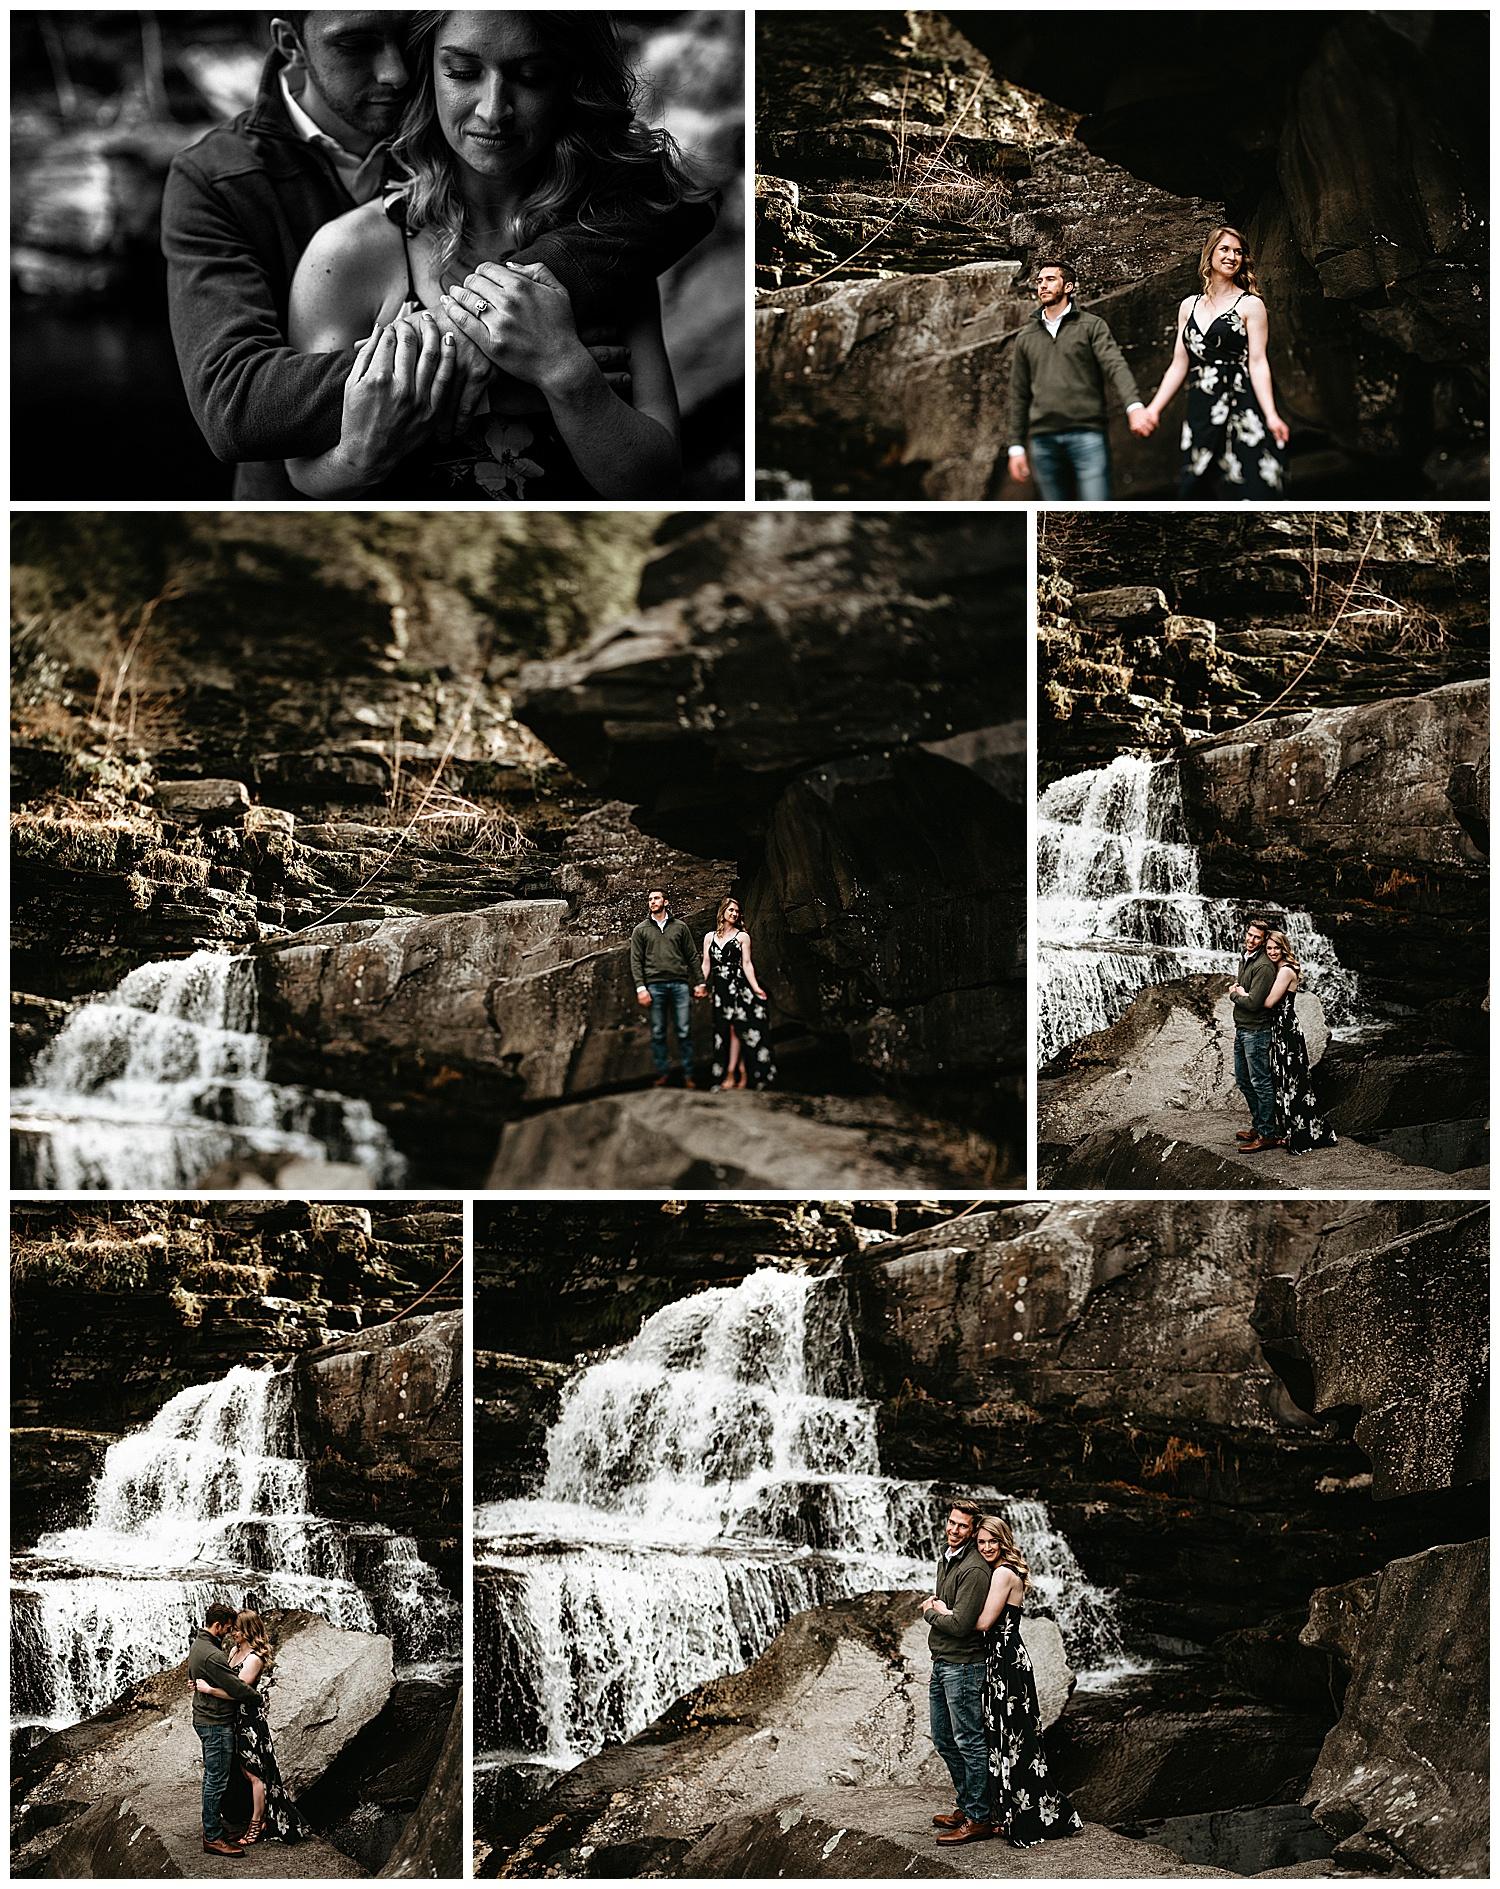 NEPA-Lehigh-Valley-Wedding-Photographer-Ledges-Hotel-Hawley-PA_0009.jpg